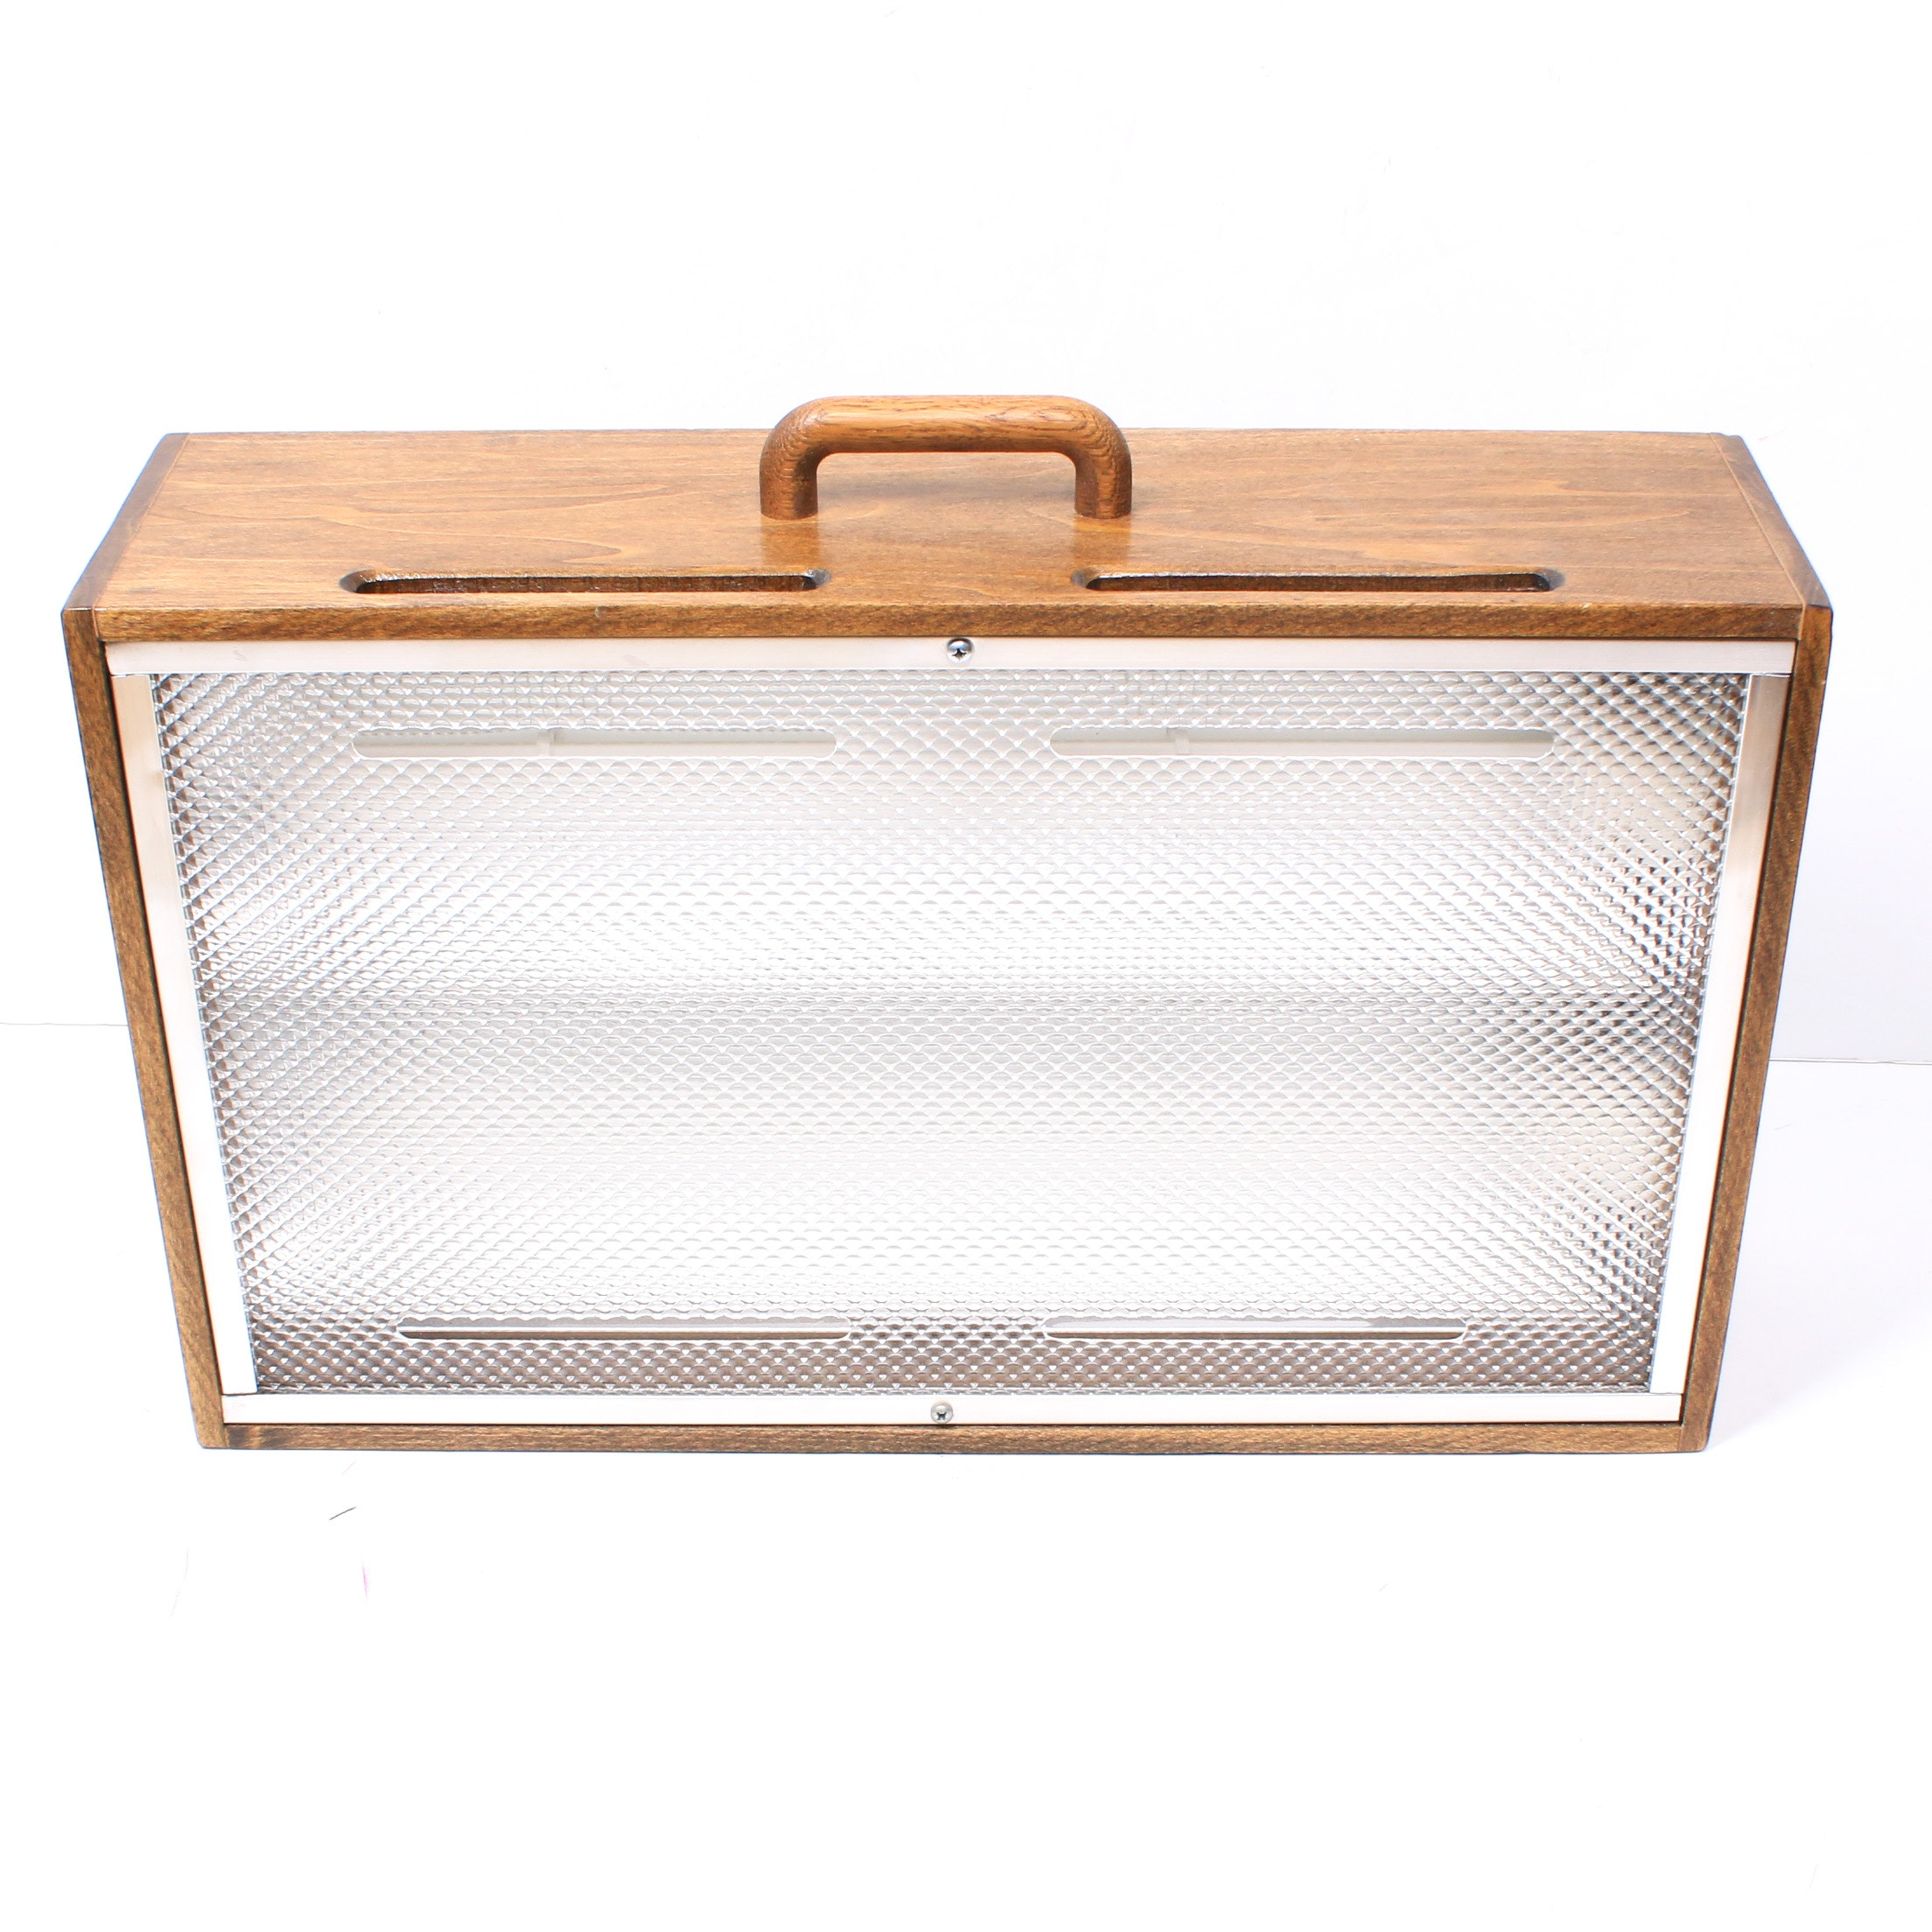 UltraLight High Intensity Light Box